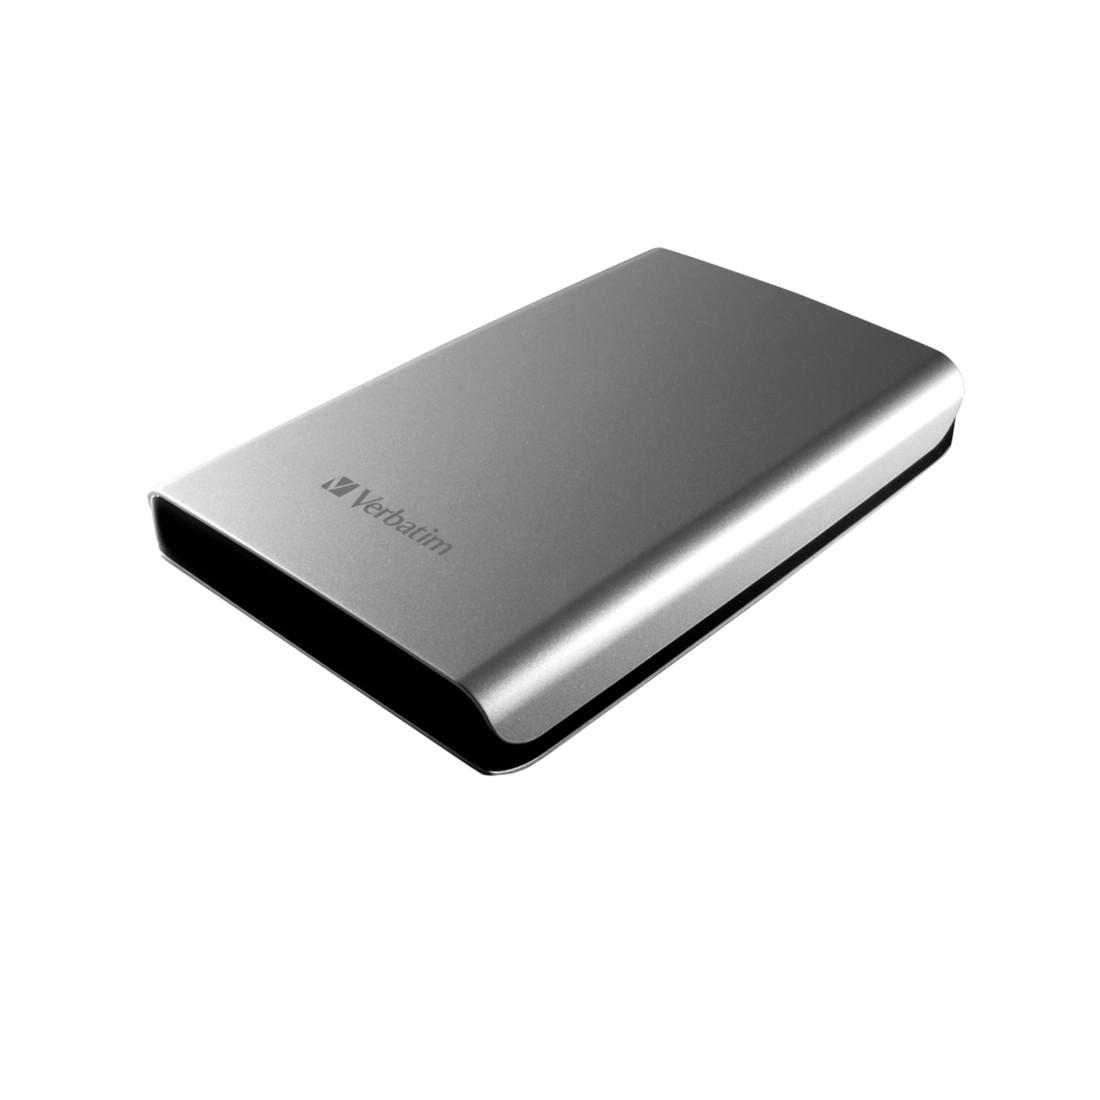 "Внешний жёсткий диск, Verbatim, Store 'n' Go, 53189, 2TB, 2.5"", USB 3.0, Серебристый"